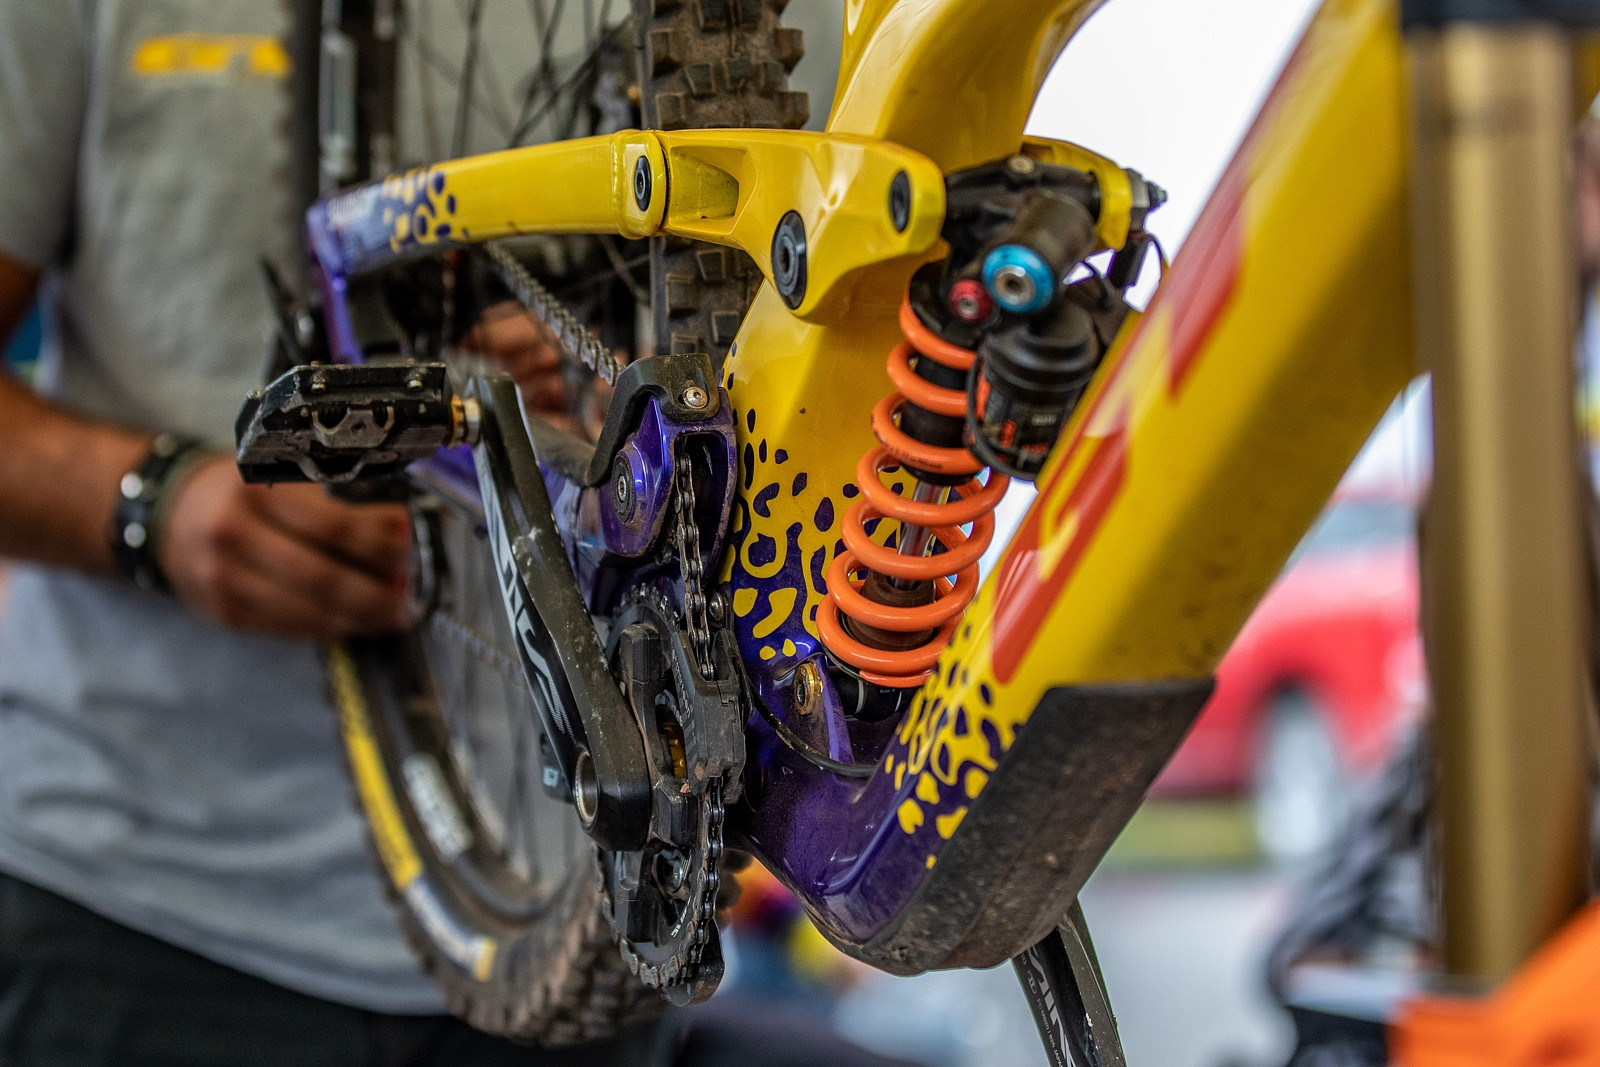 Ethan Craik's GT Fury - PIT BITS 2 - Snowshoe World Cup Downhill - Mountain Biking Pictures - Vital MTB